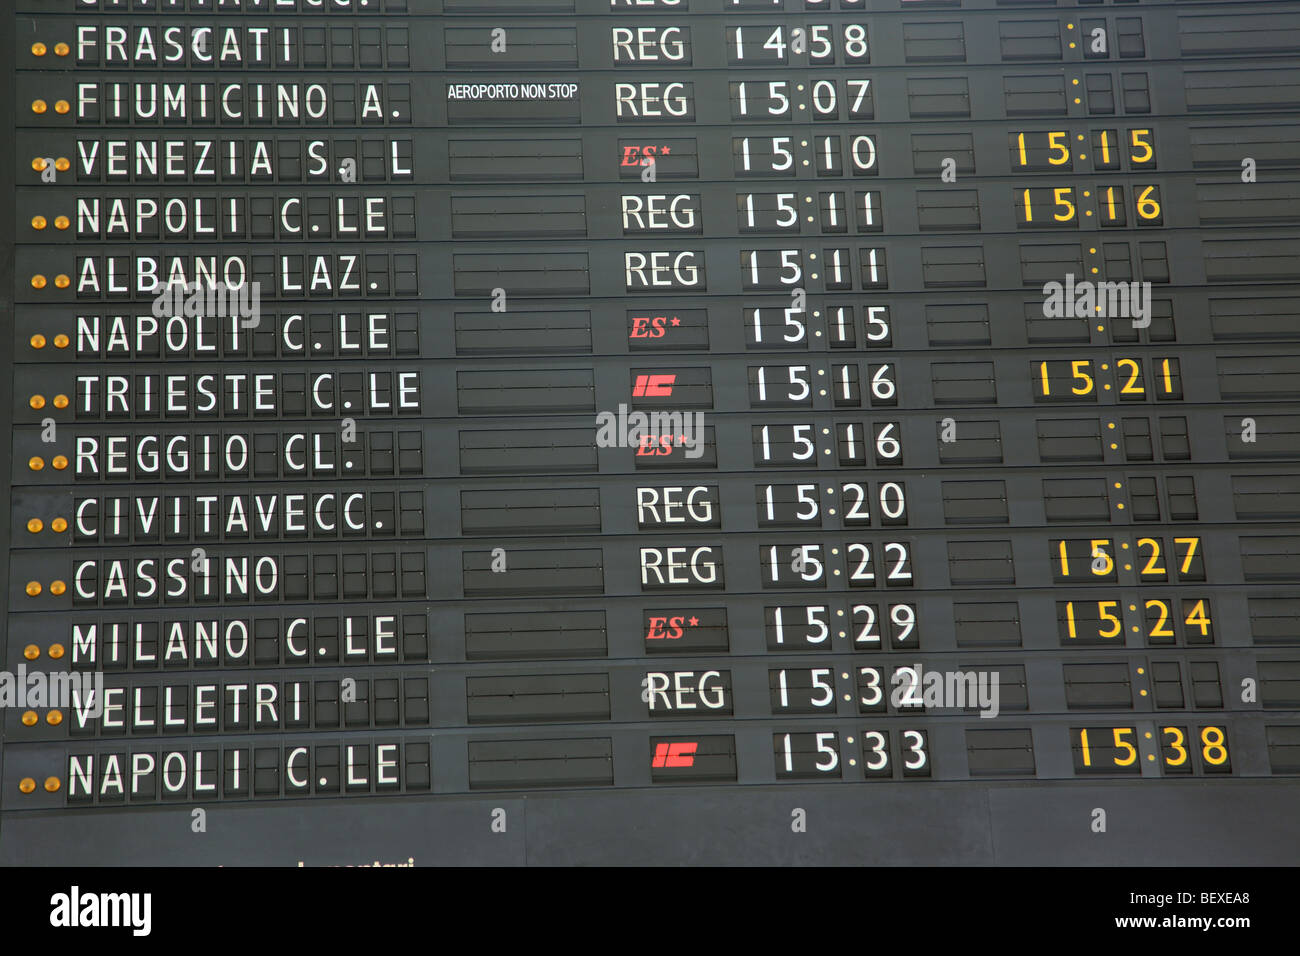 Board showing departure times at Stazione Termini in Rome - Stock Image